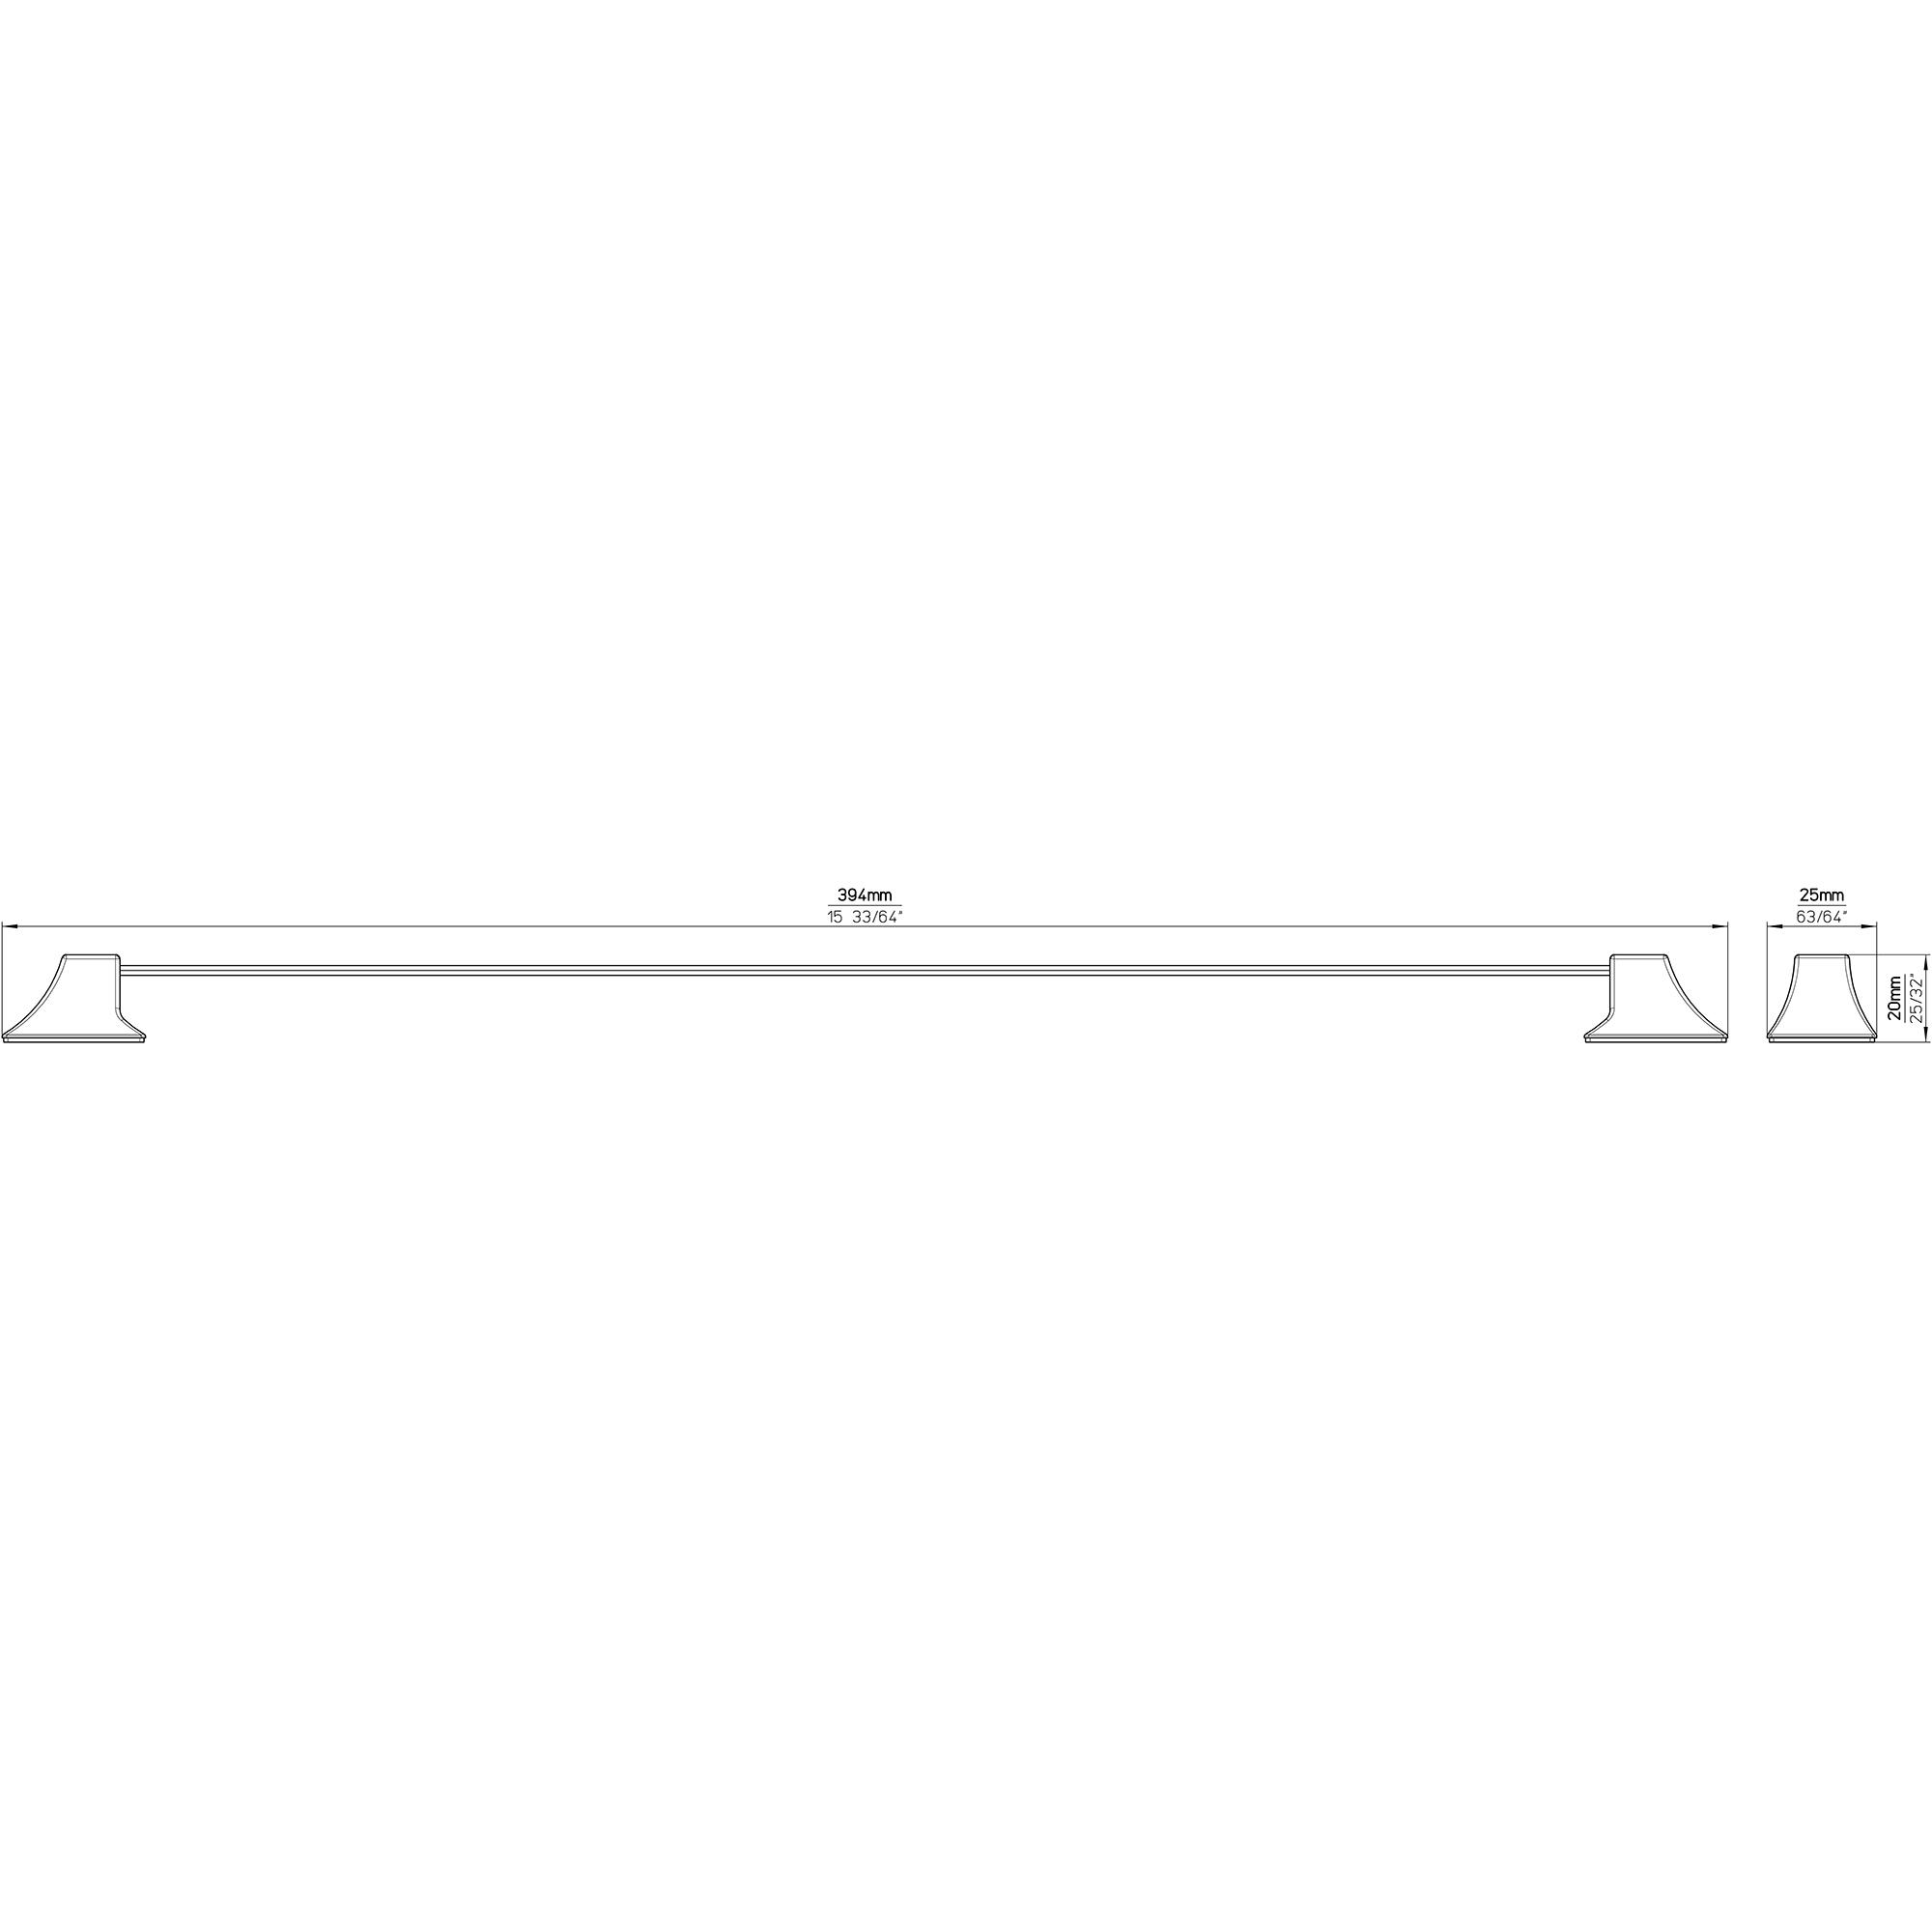 Krawattenhalter H207-394A3A4V1BK